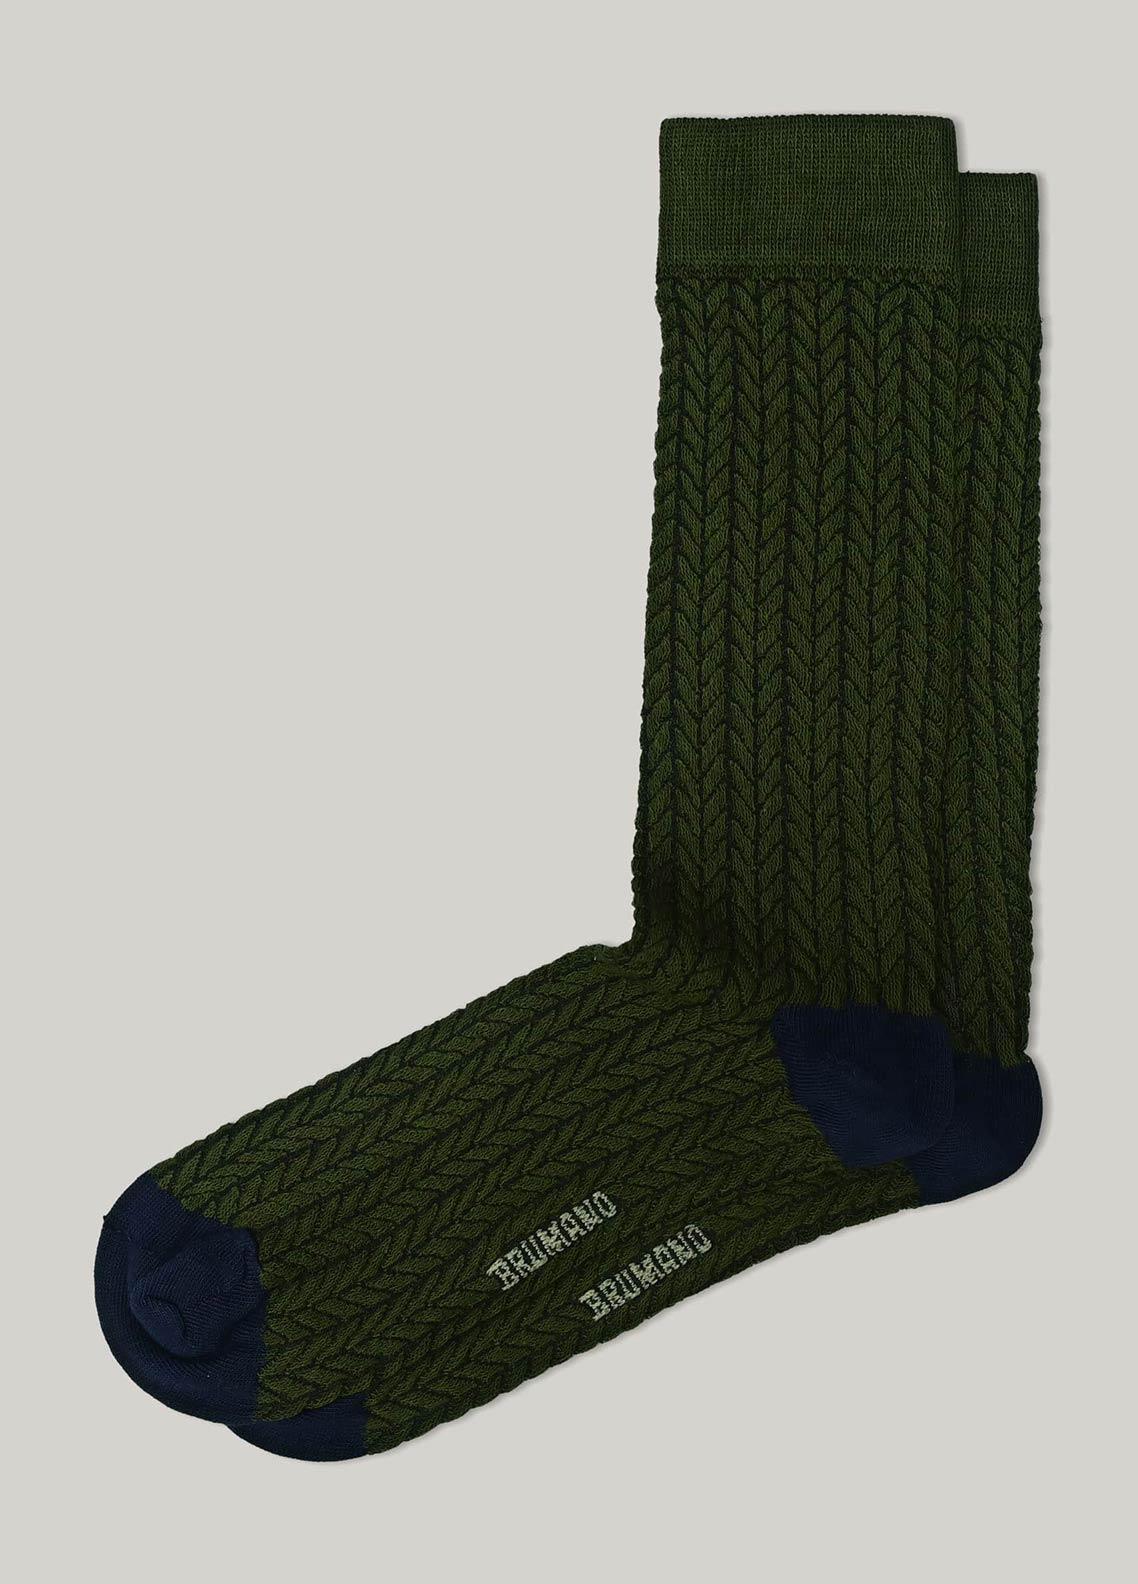 Brumano Cotton Socks BM20CSK Olive Green Herringbone Cotton Socks